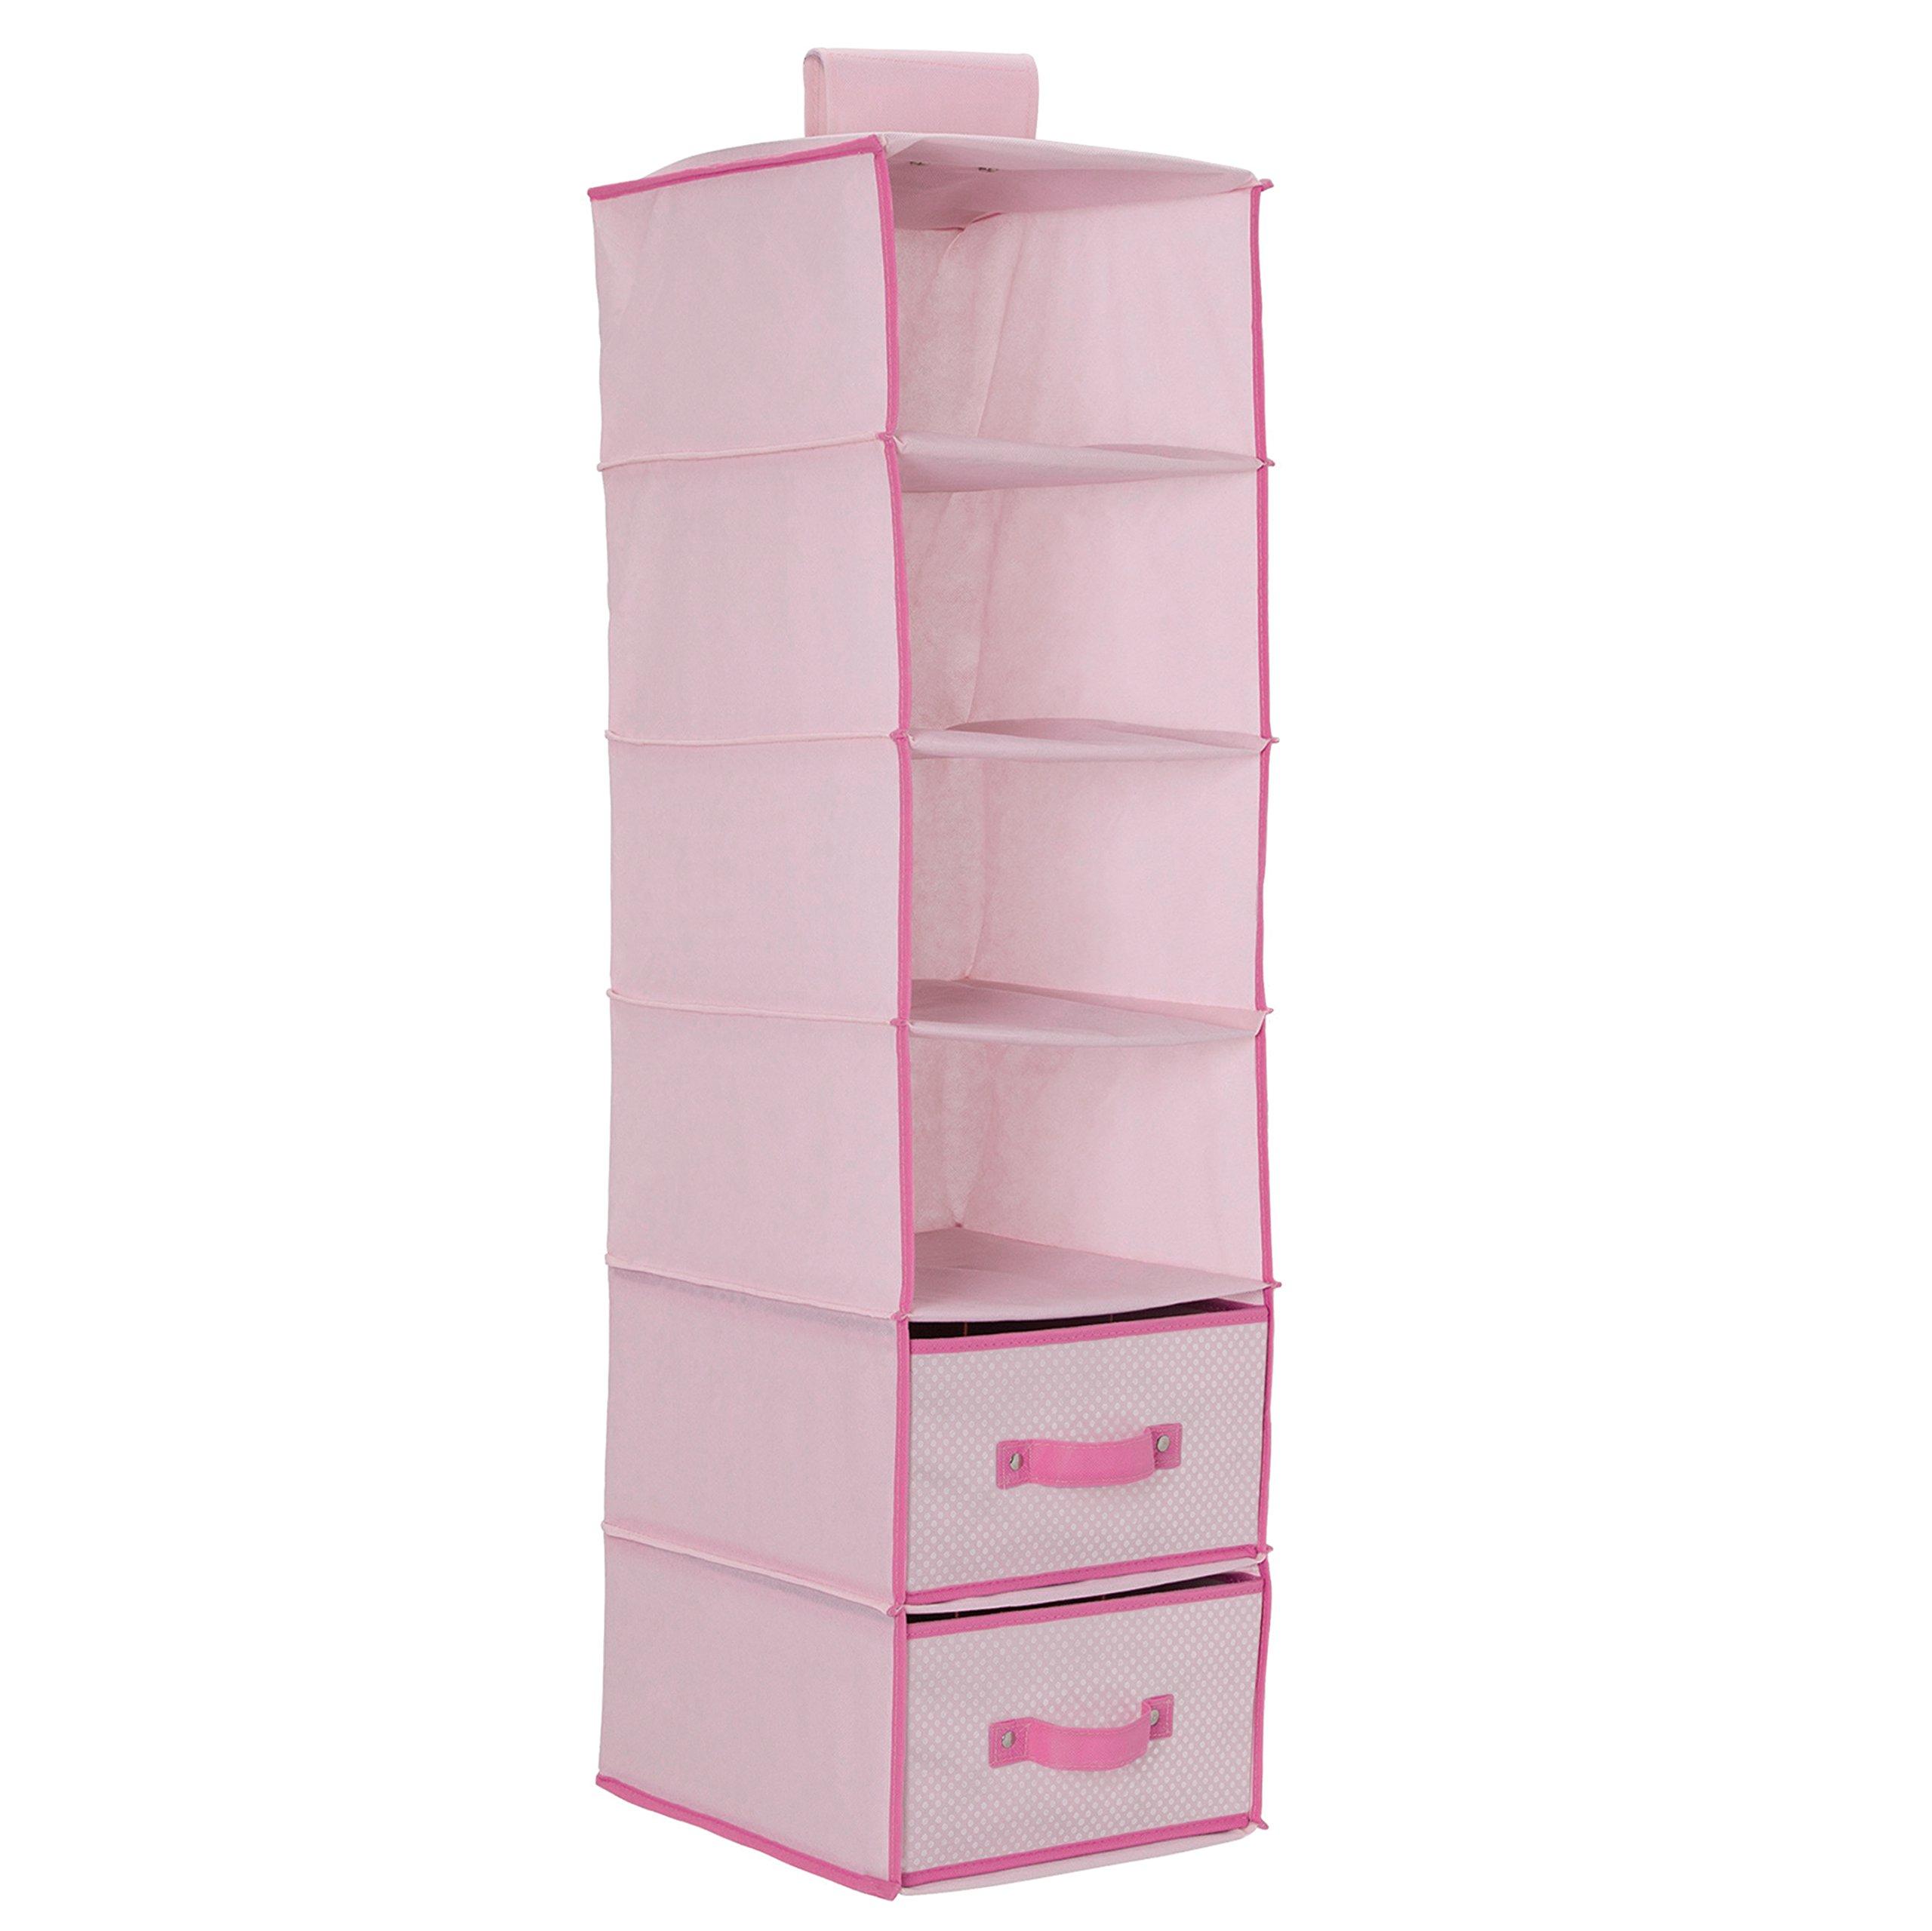 Delta Children 6 Shelf Storage With 2 Drawers, Barely Pink